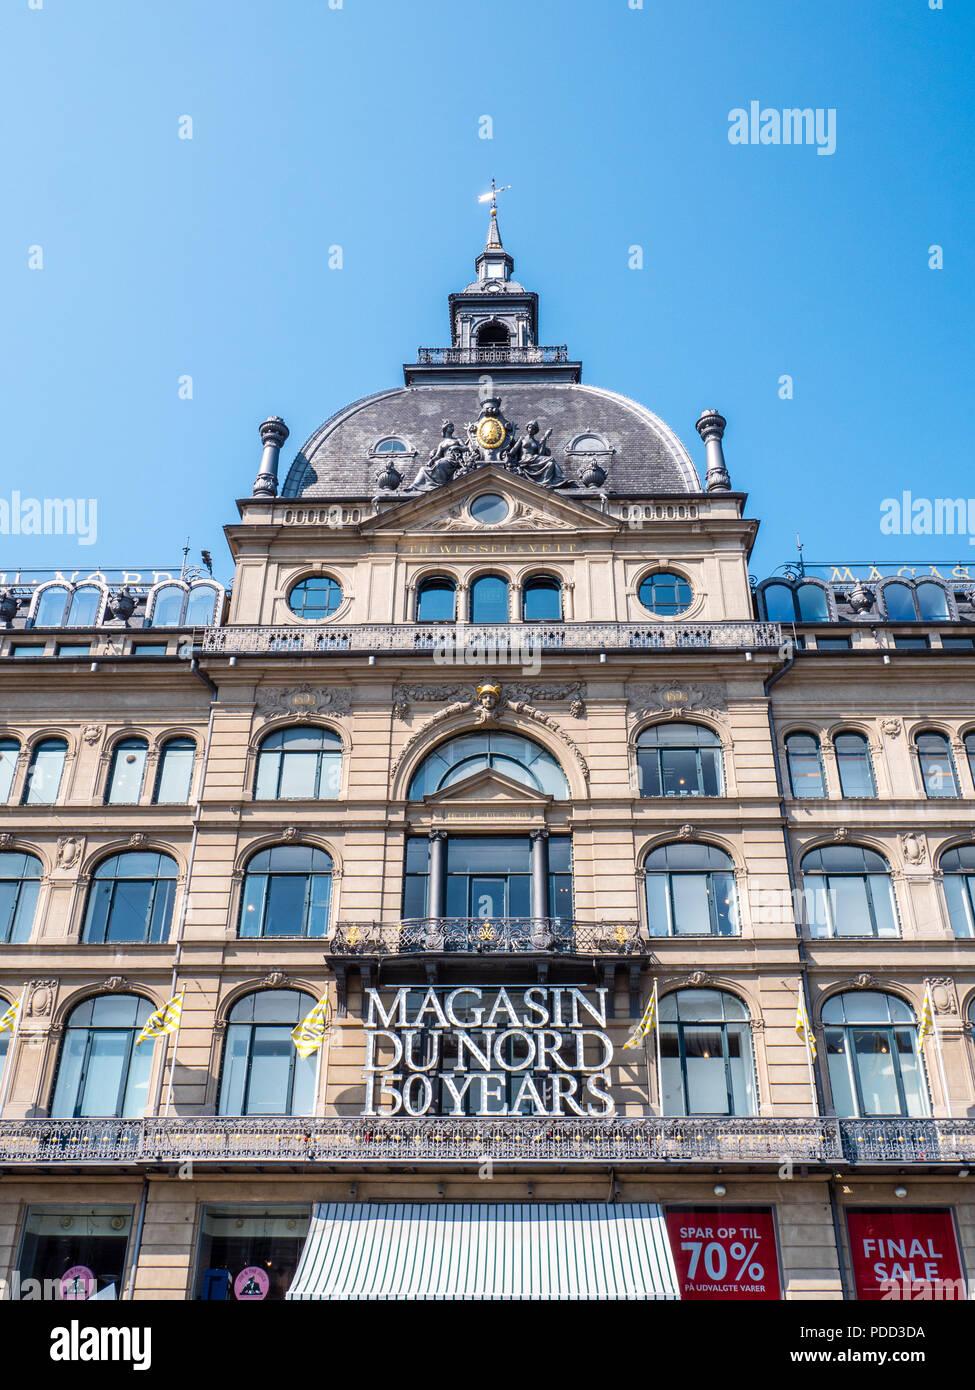 Magasin du Nord, Department Store, owned by Debenhams, Copenhagen, Zealand, Denmark, Europe. - Stock Image